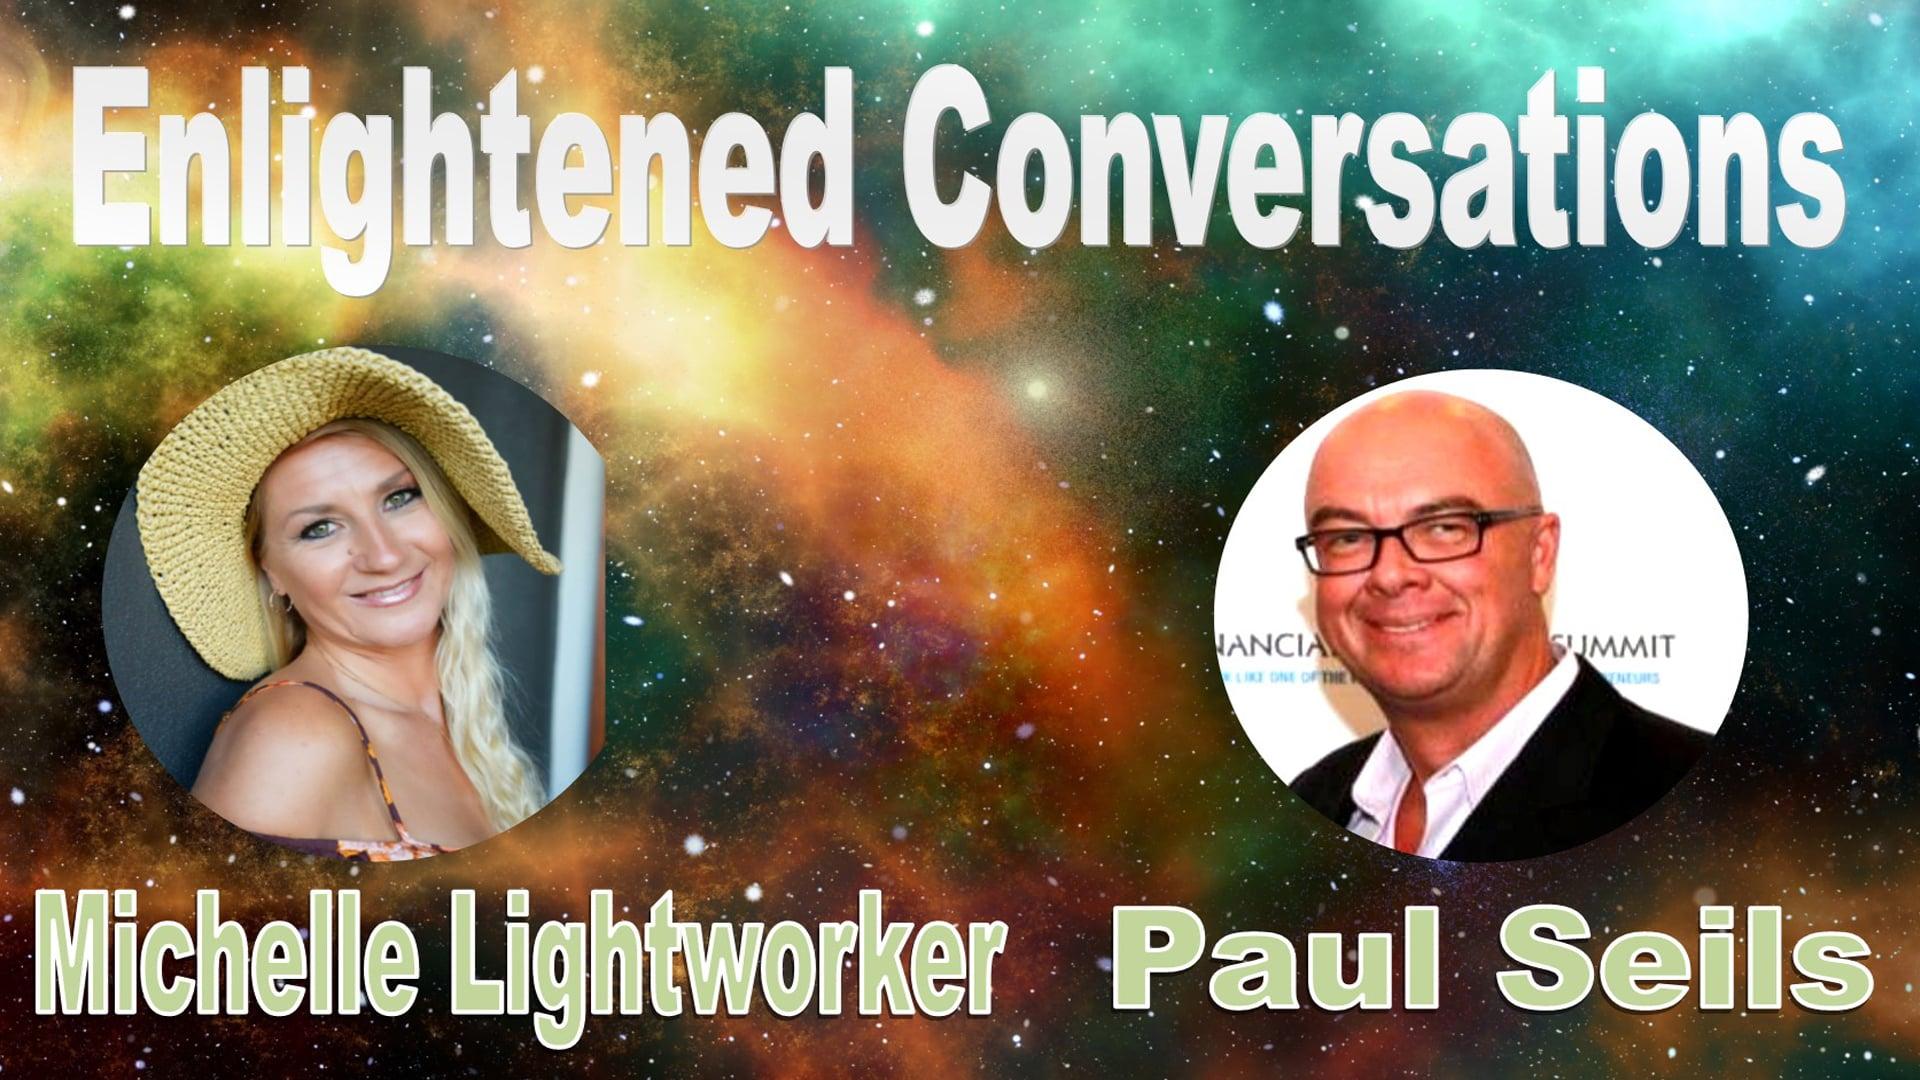 Enlightened Conversation – Paul Seils